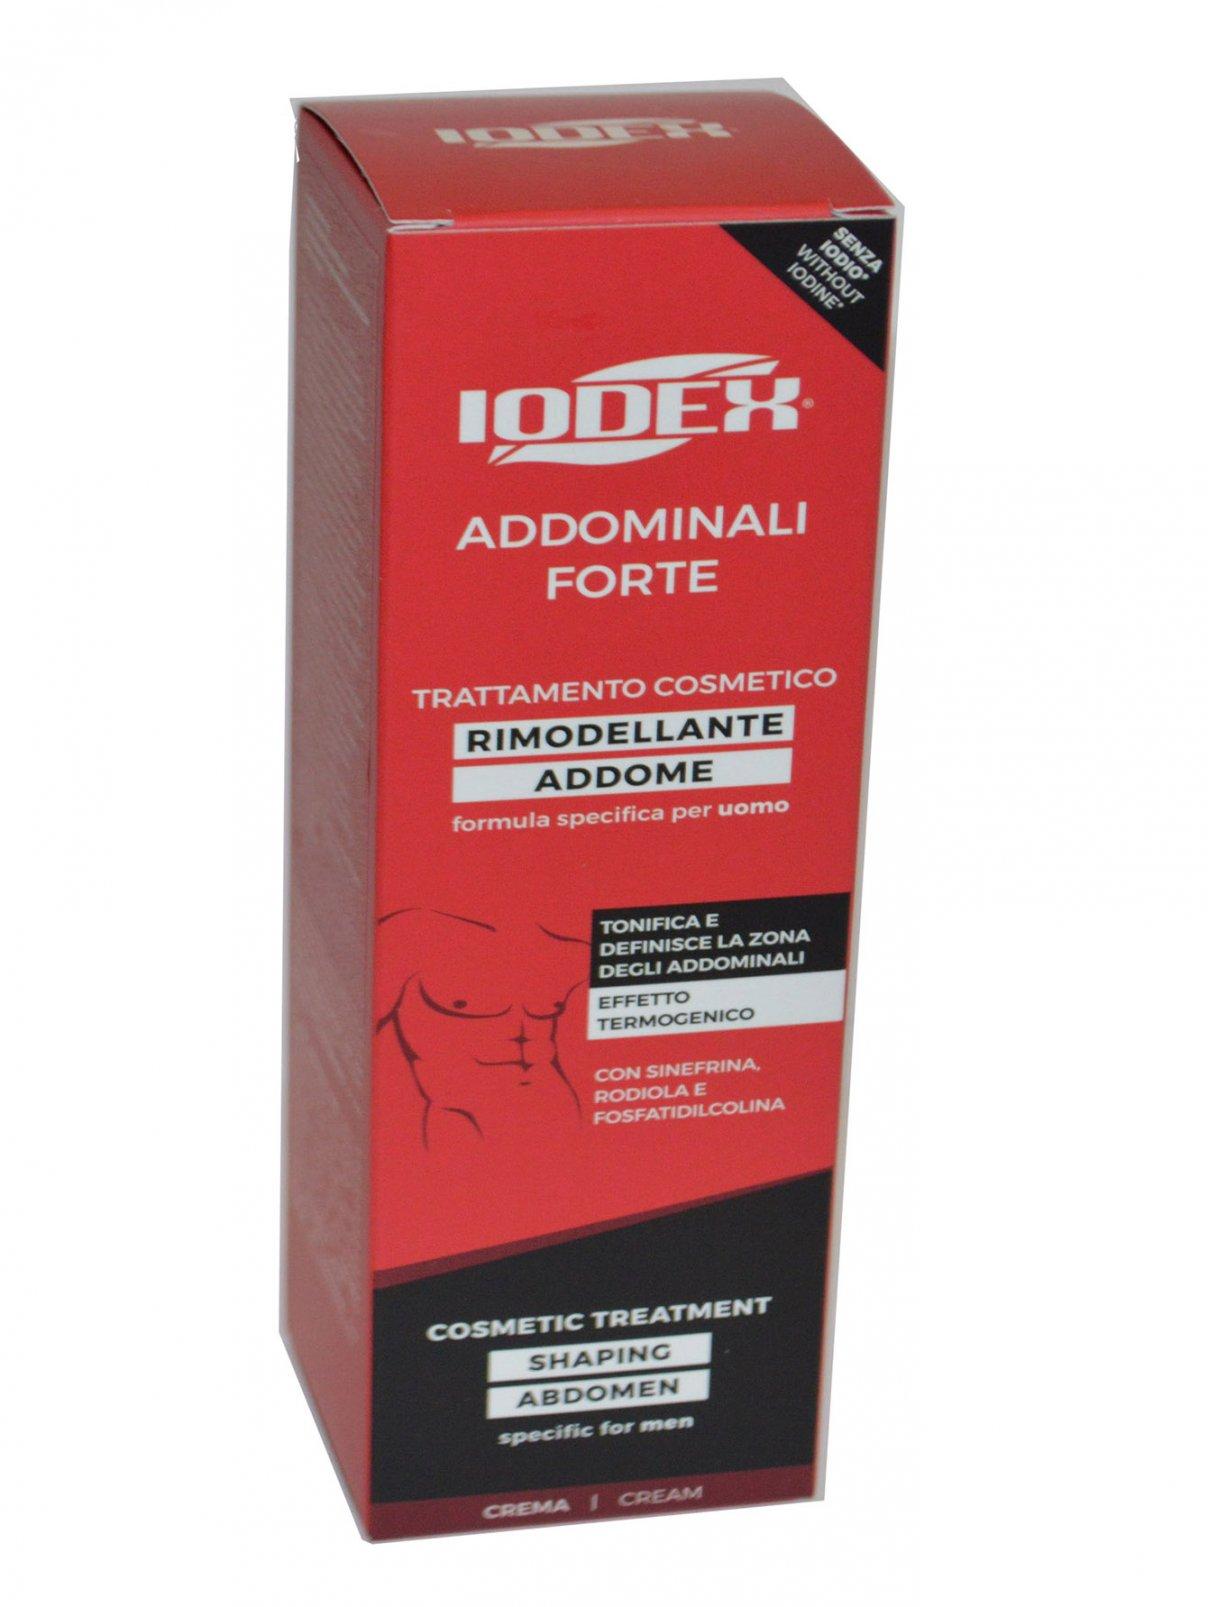 Крем для тела Iodex Addominali Forte 200 мл Natural Project  –  Общий вид